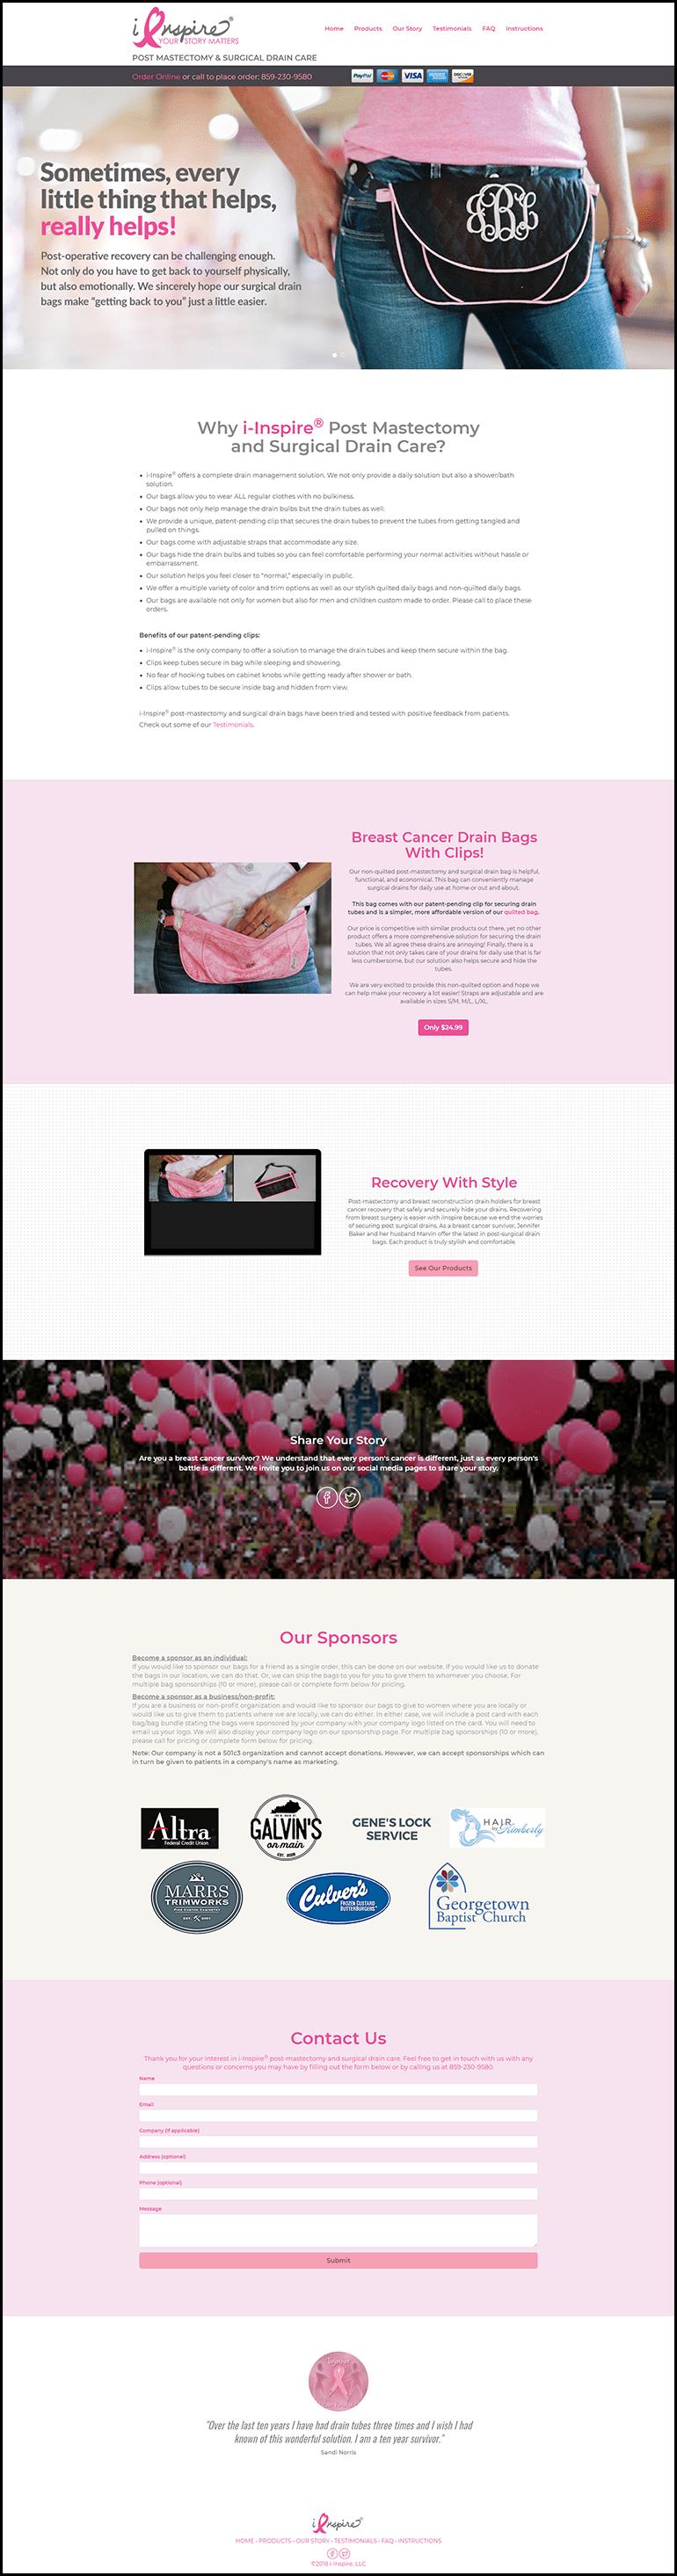 iInspire website homepage layout.